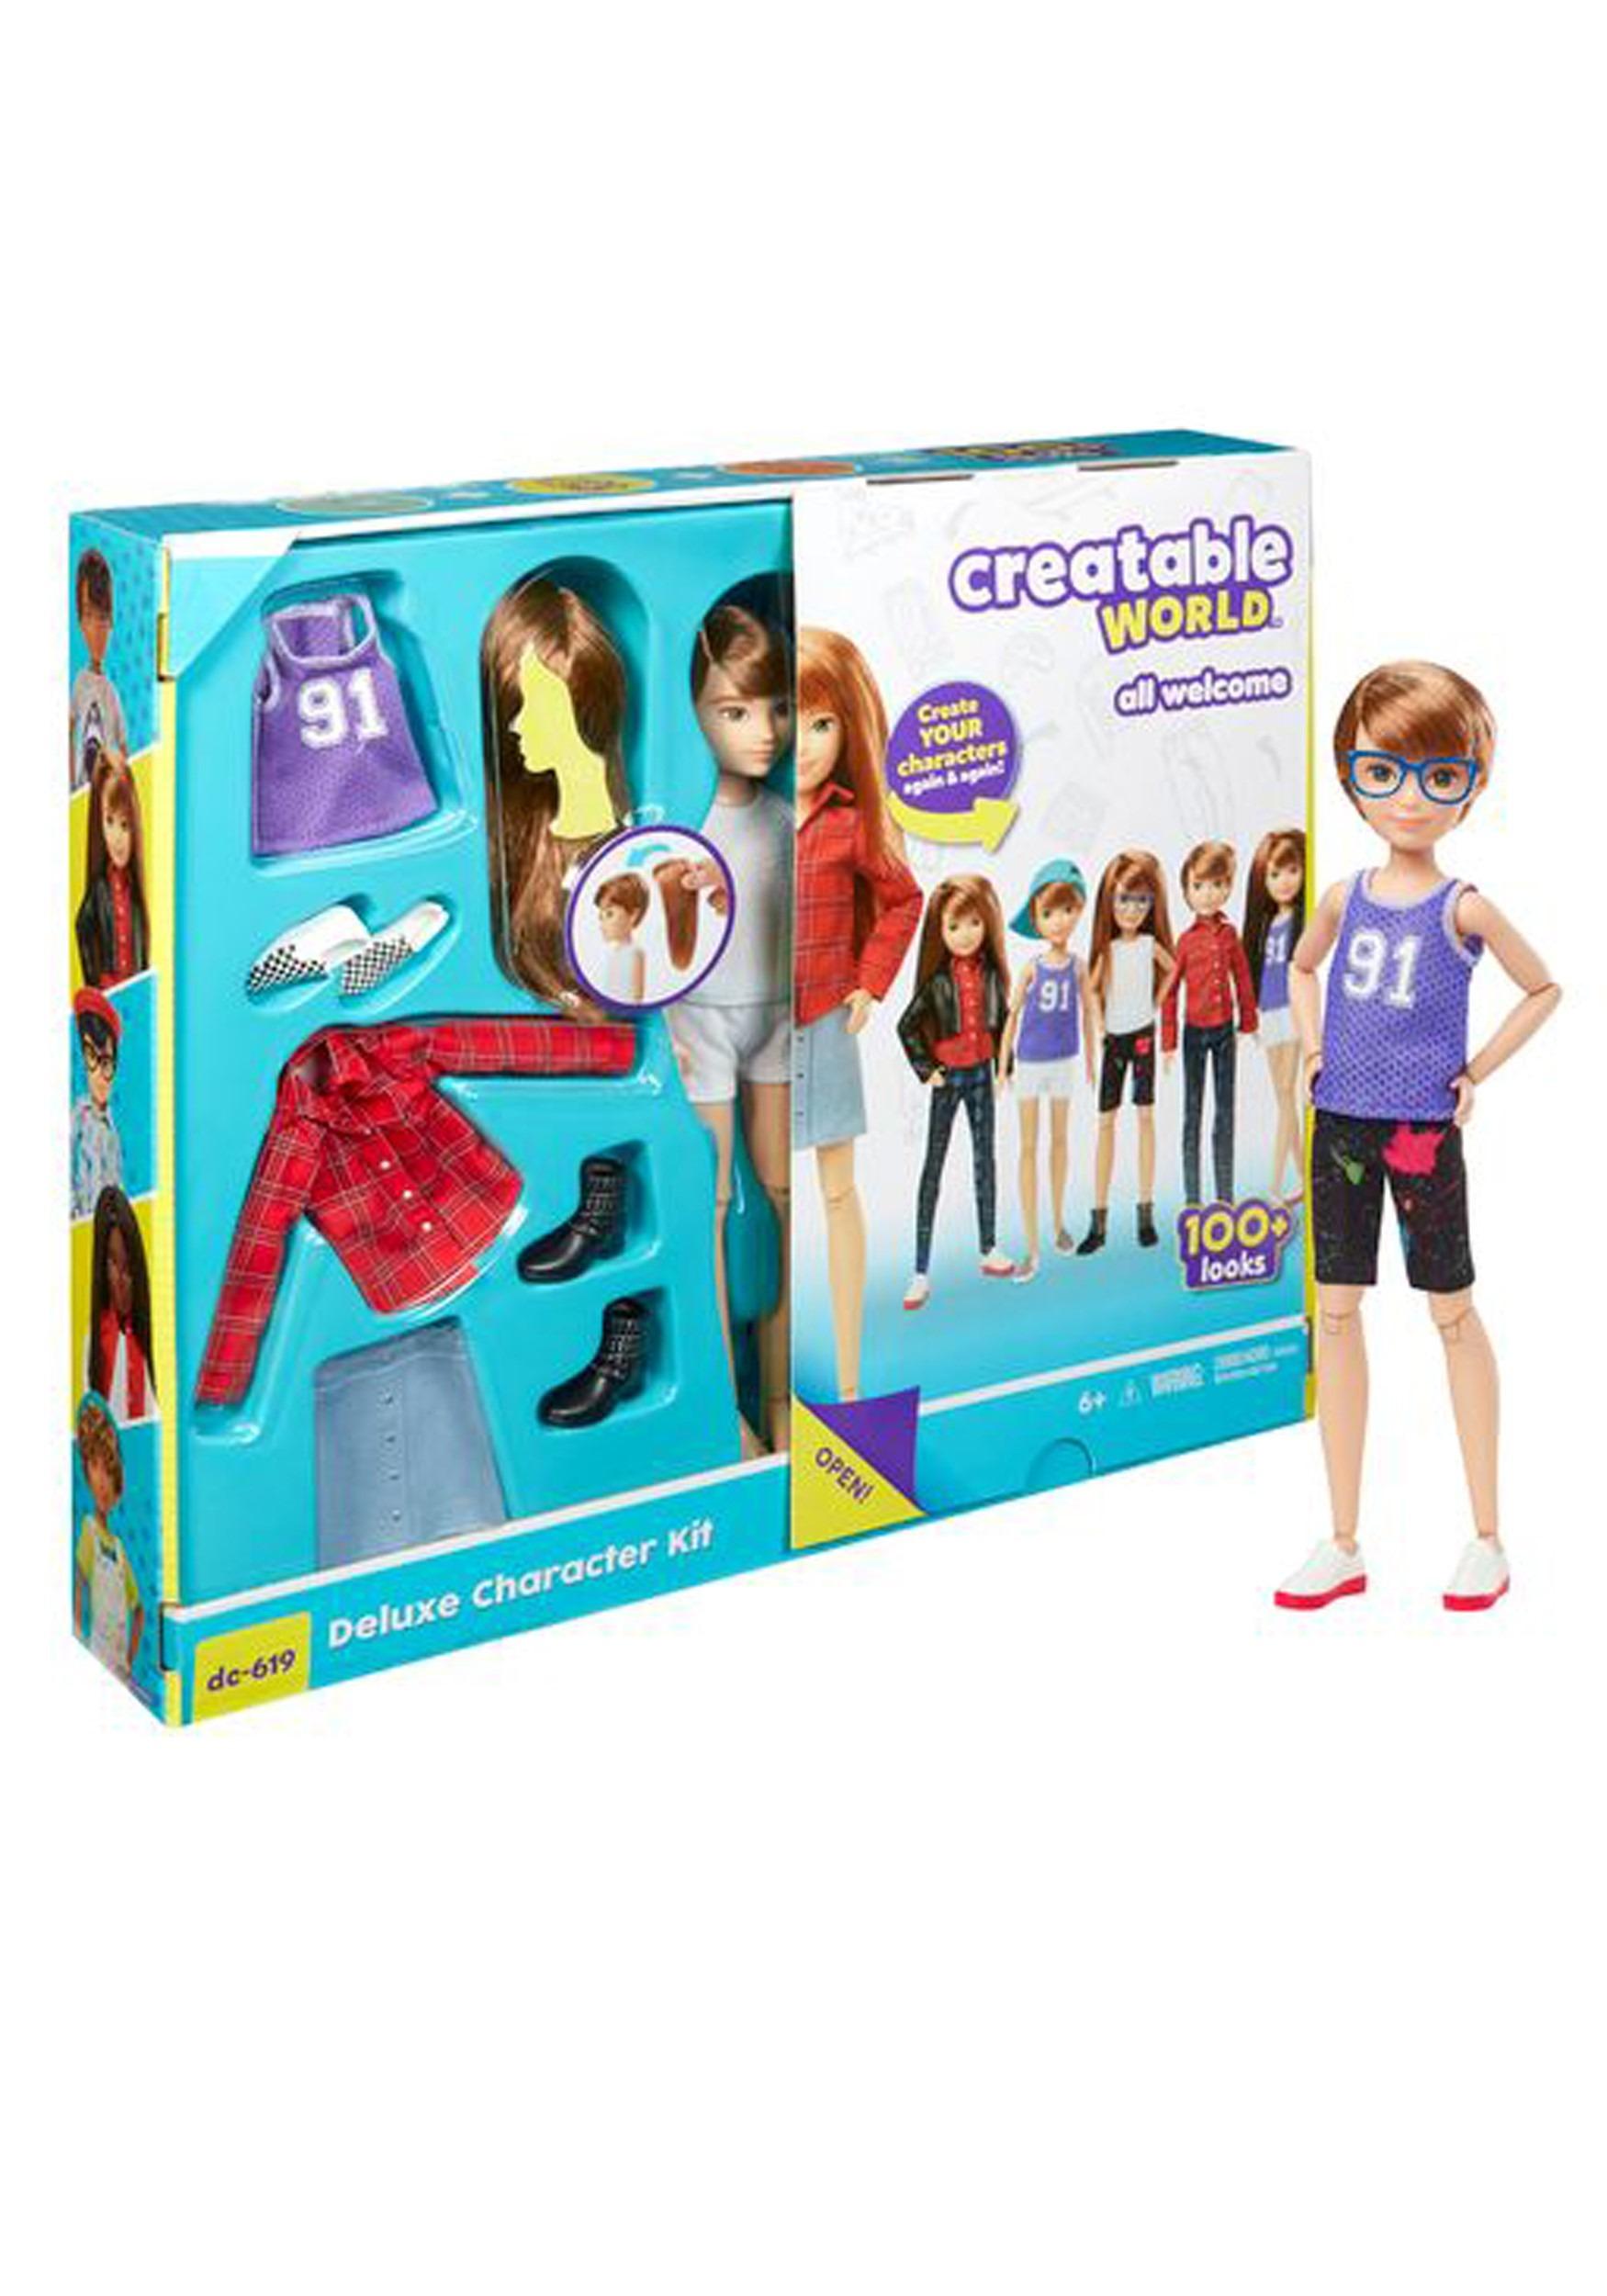 Creatable World - Deluxe Customizable Doll Character Kit